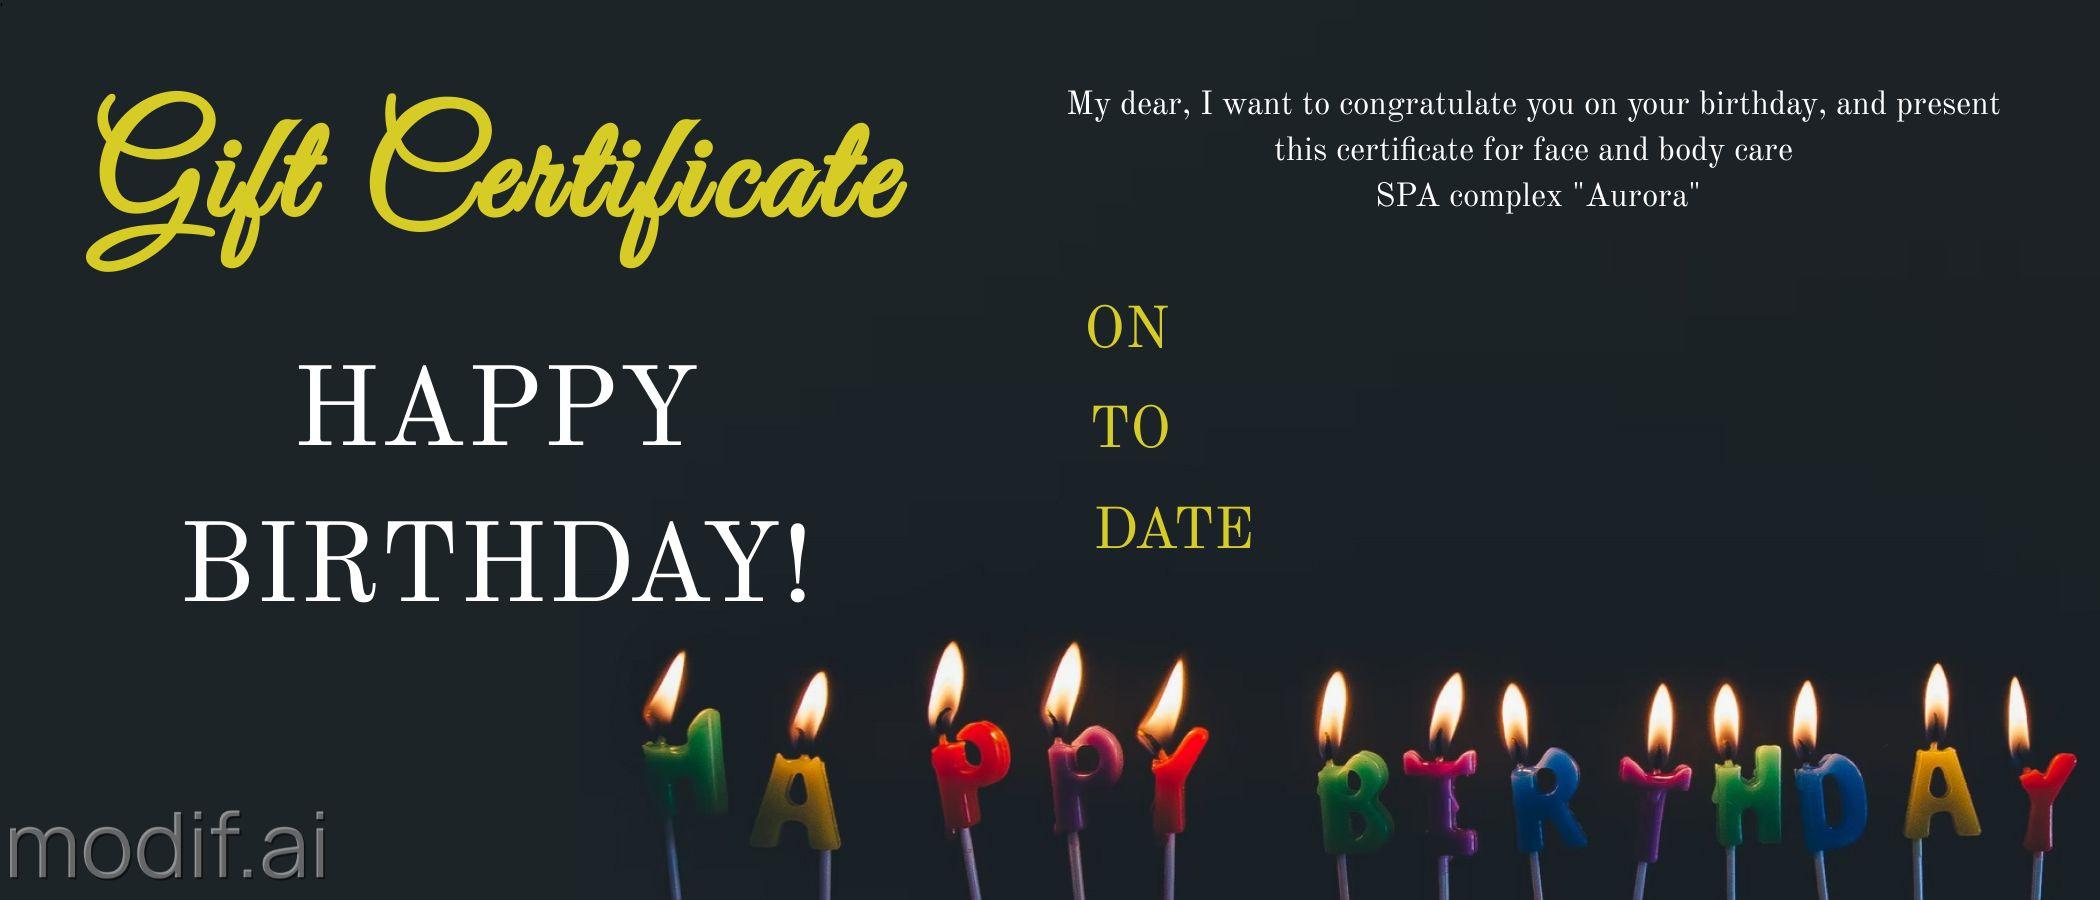 Birthday Gift Certificate Design Template